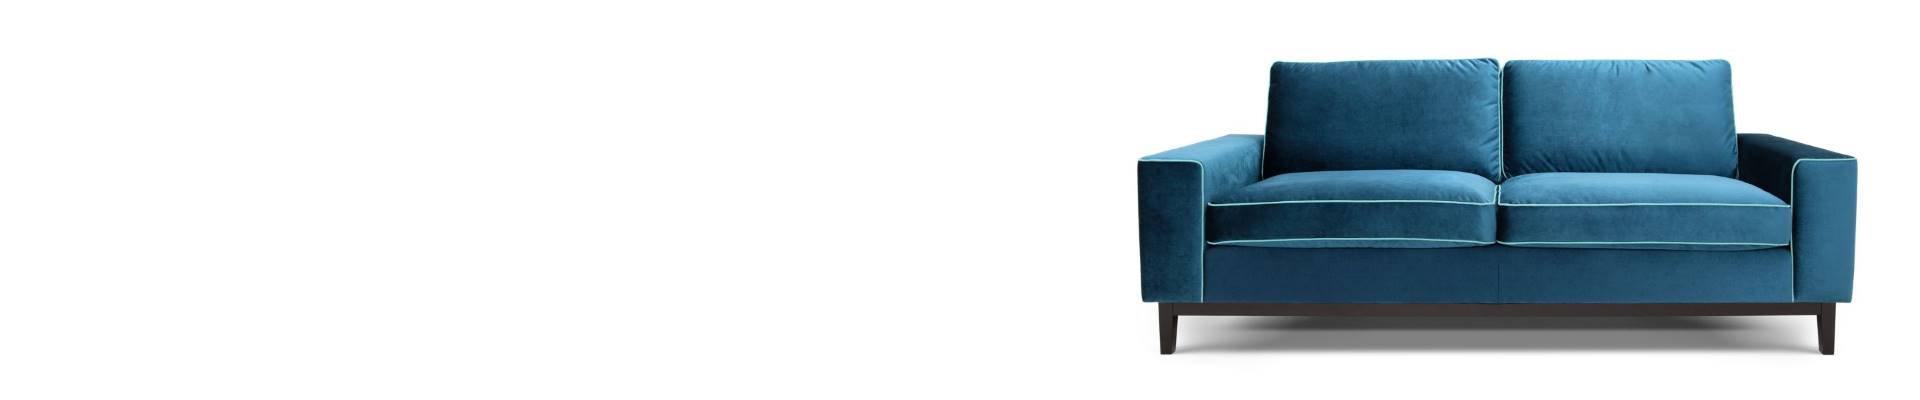 Sofa blue 400x1920.jpg